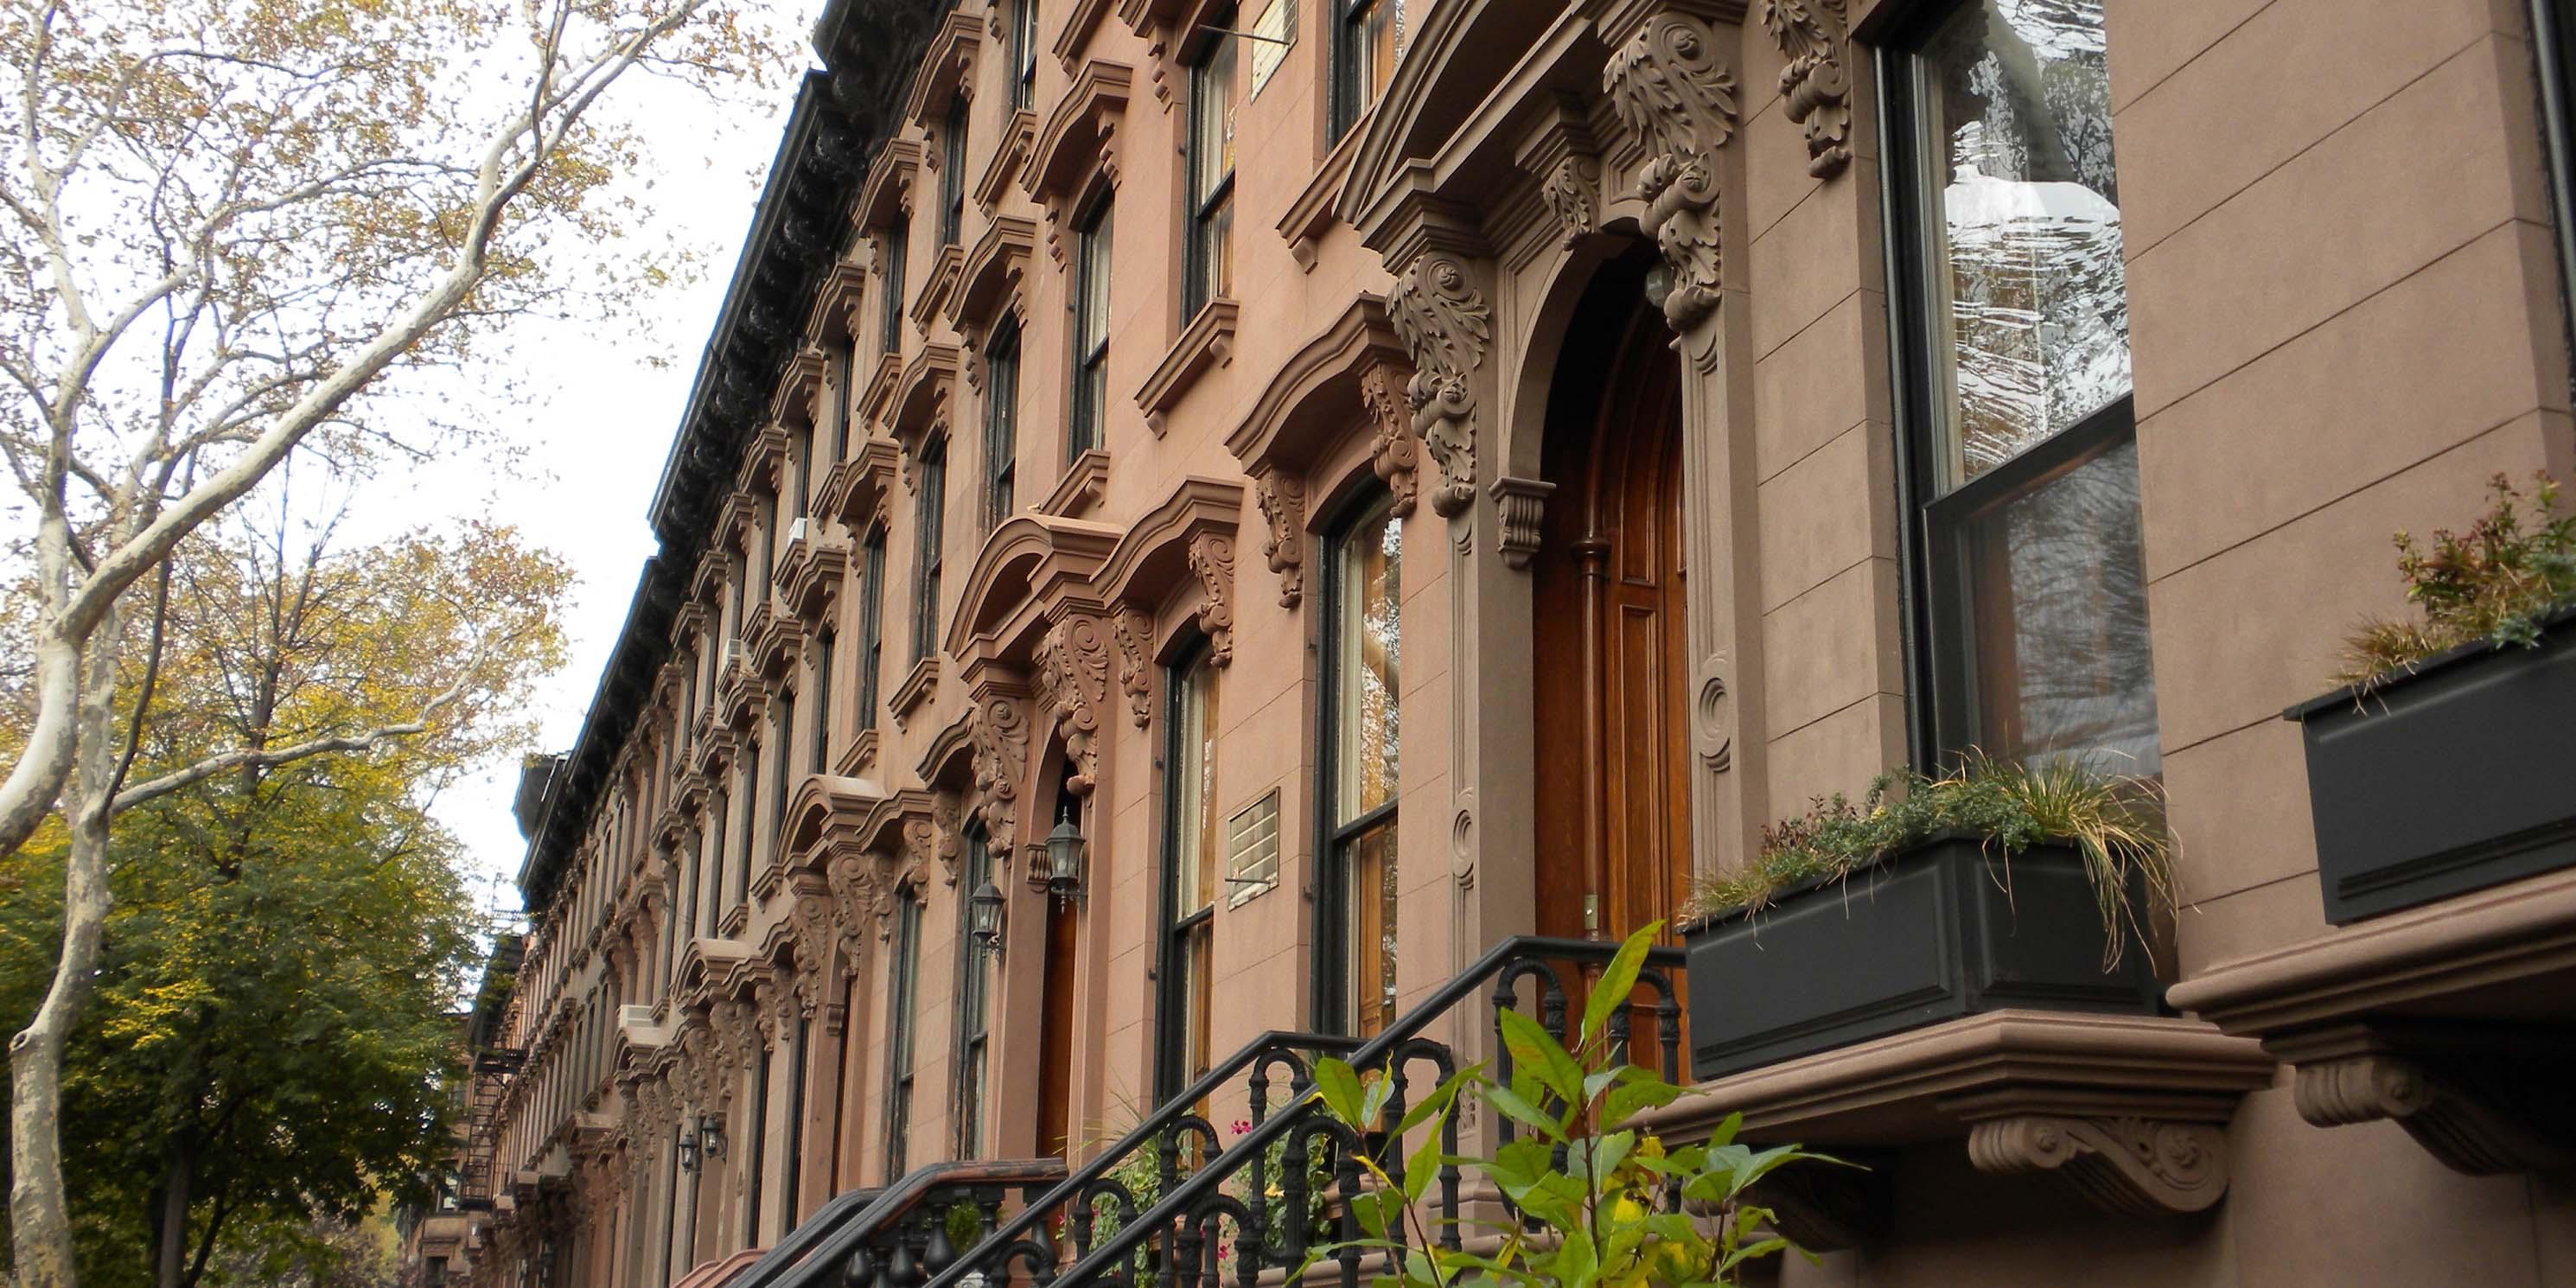 Exterior of brownstones in Fort Greene, Brooklyn